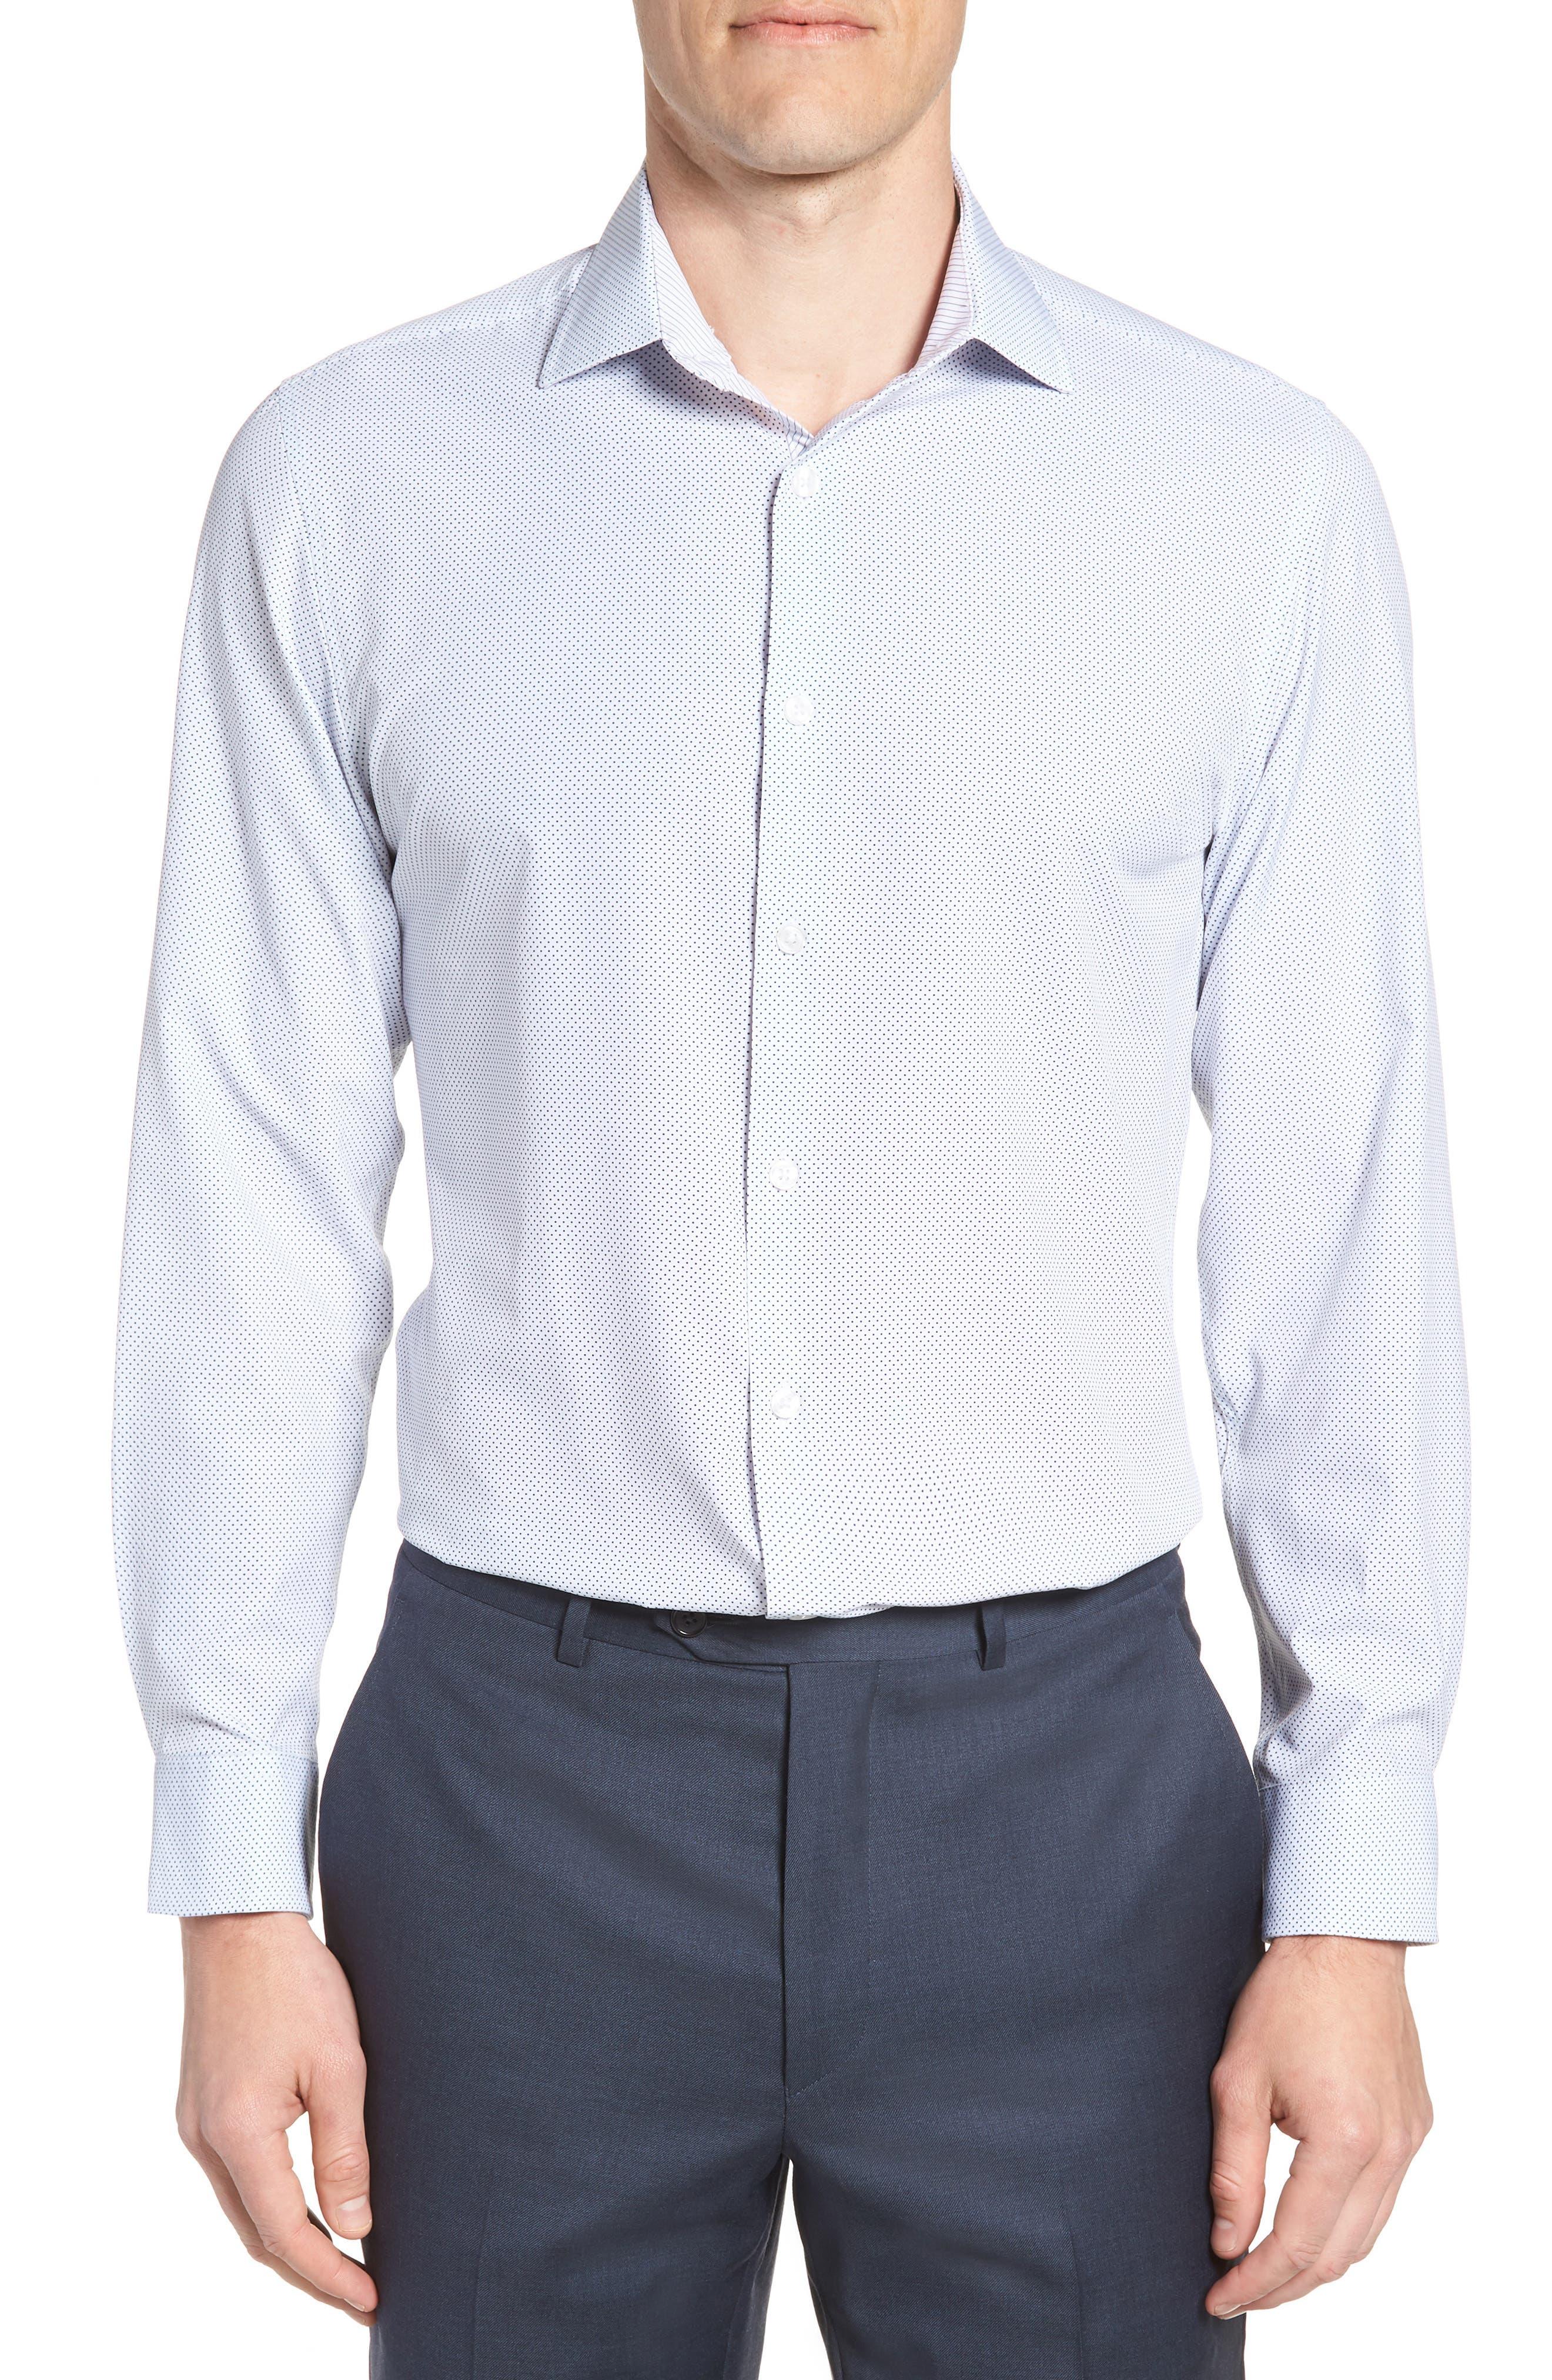 W.R.K Trim Fit Dot 4-Way Stretch Dress Shirt, Main, color, 100